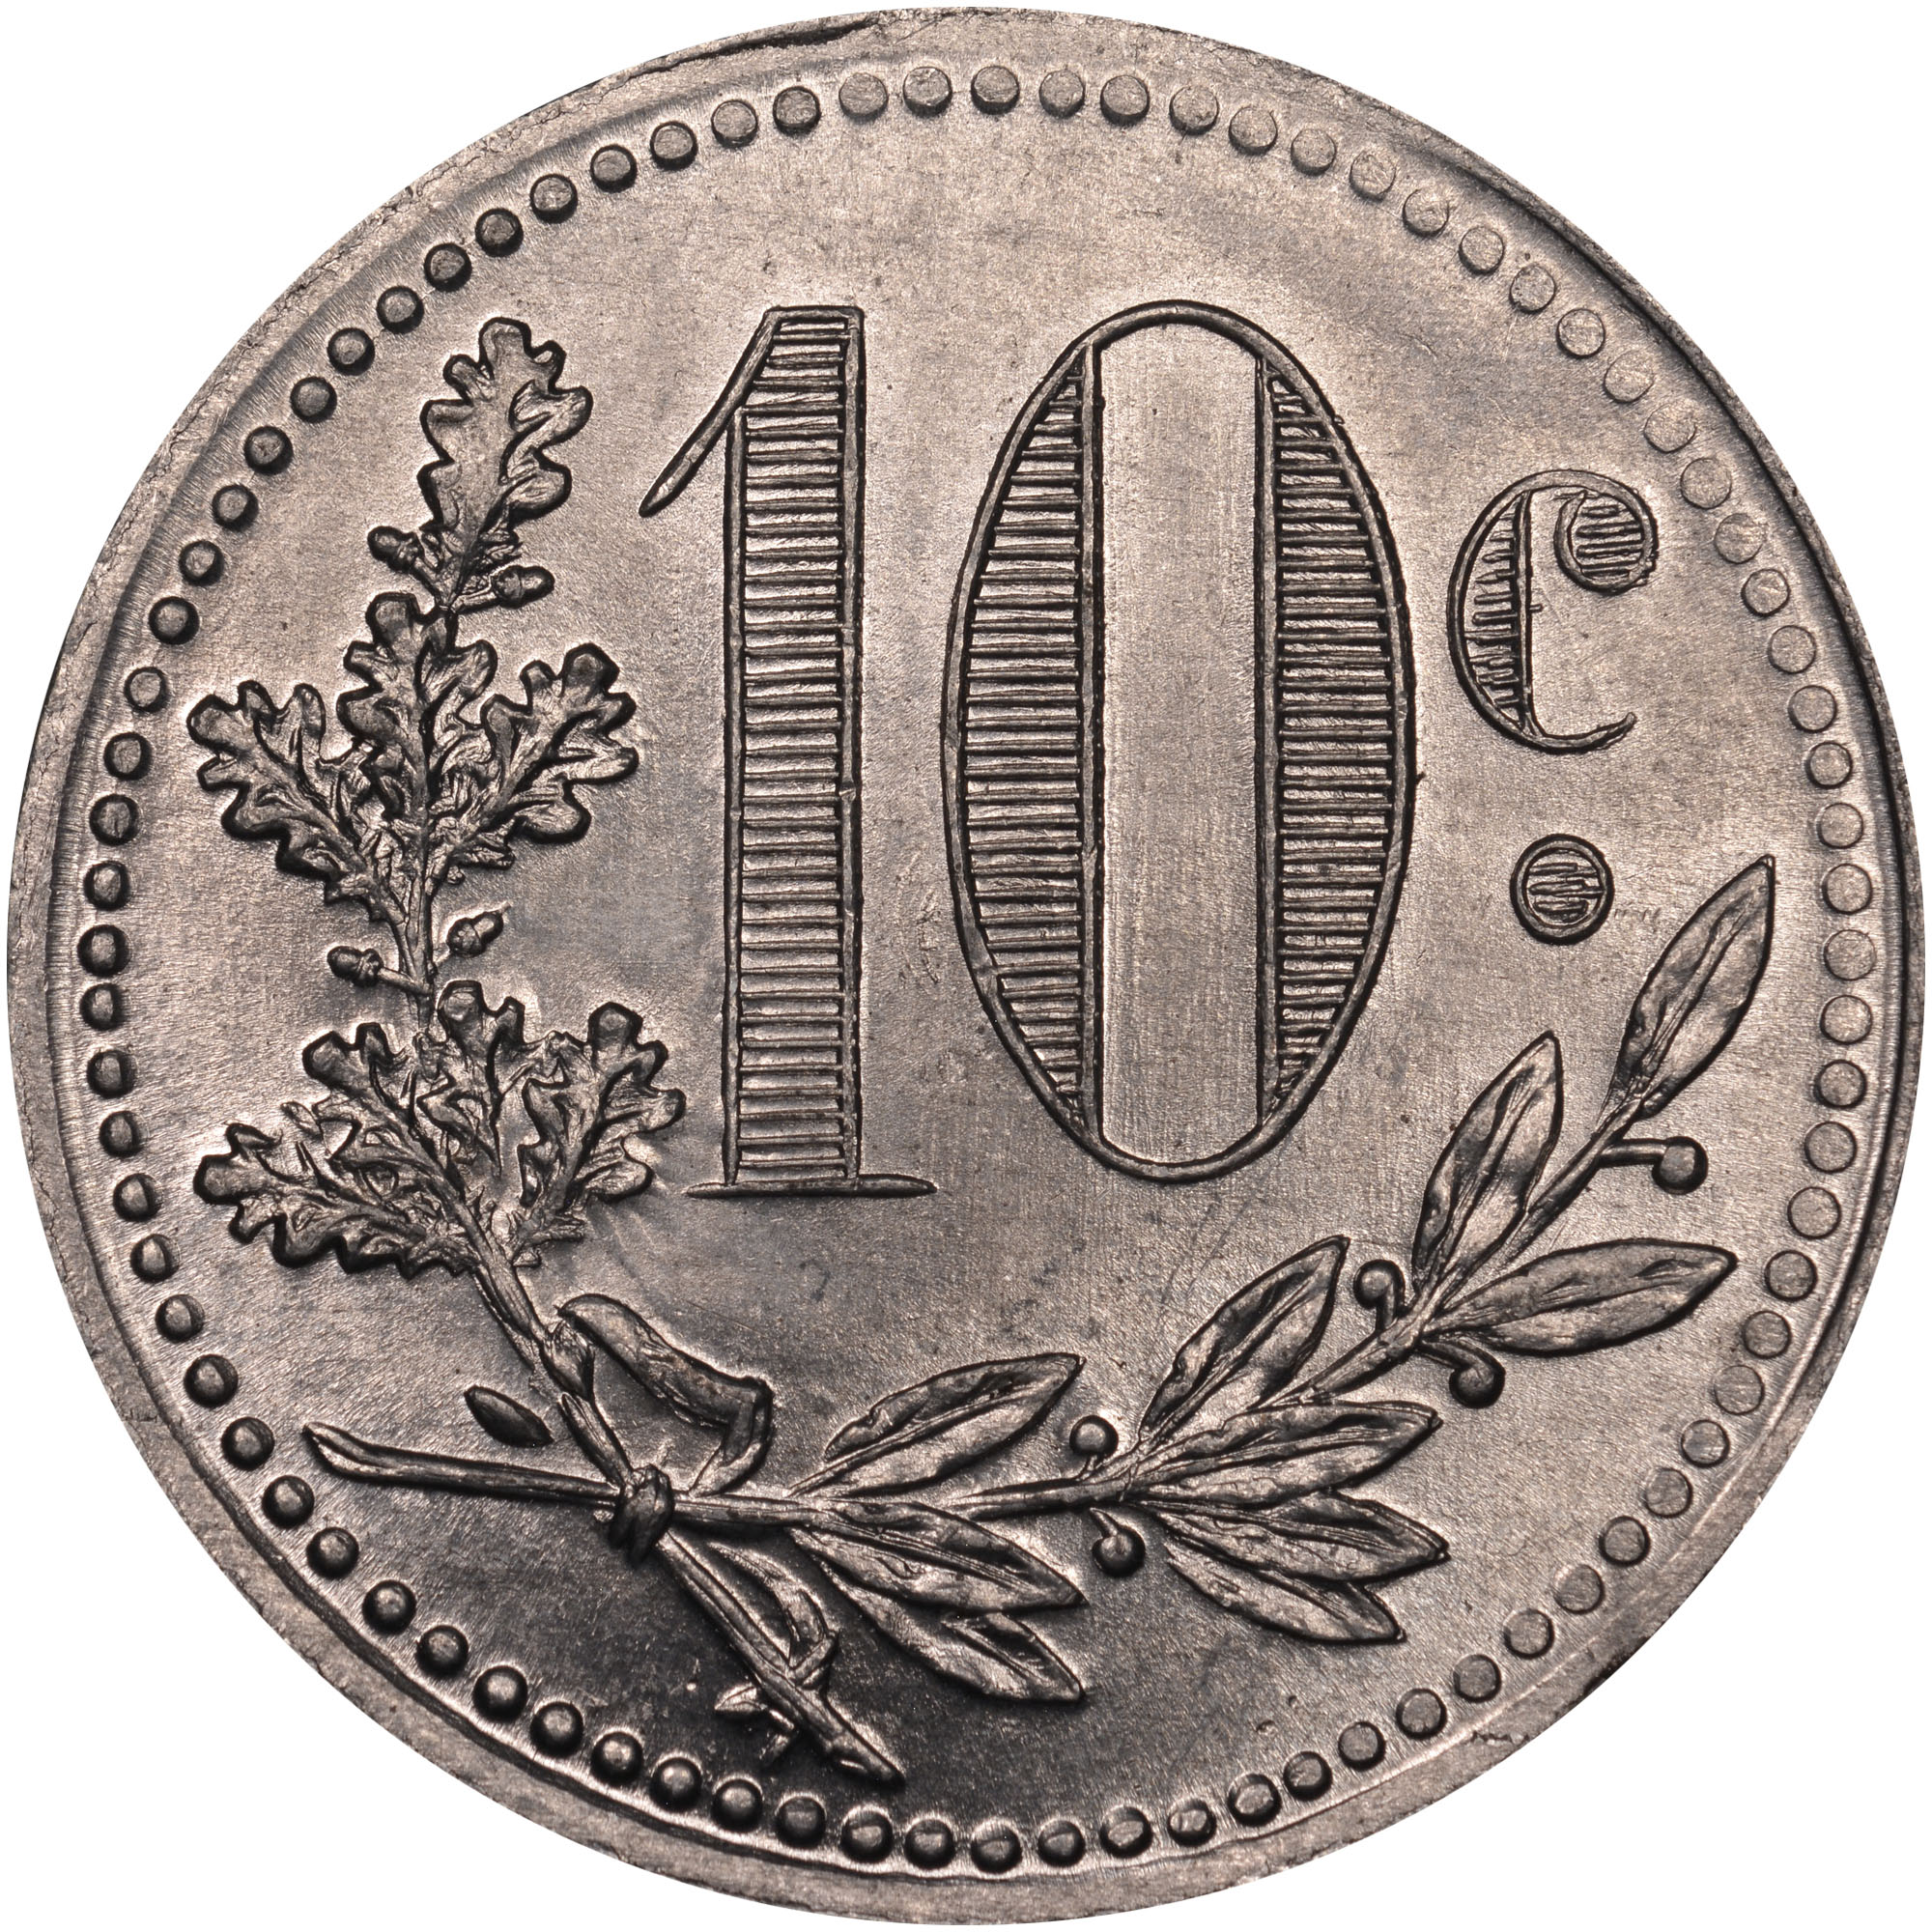 1916-1921 Algeria 10 Centimes reverse